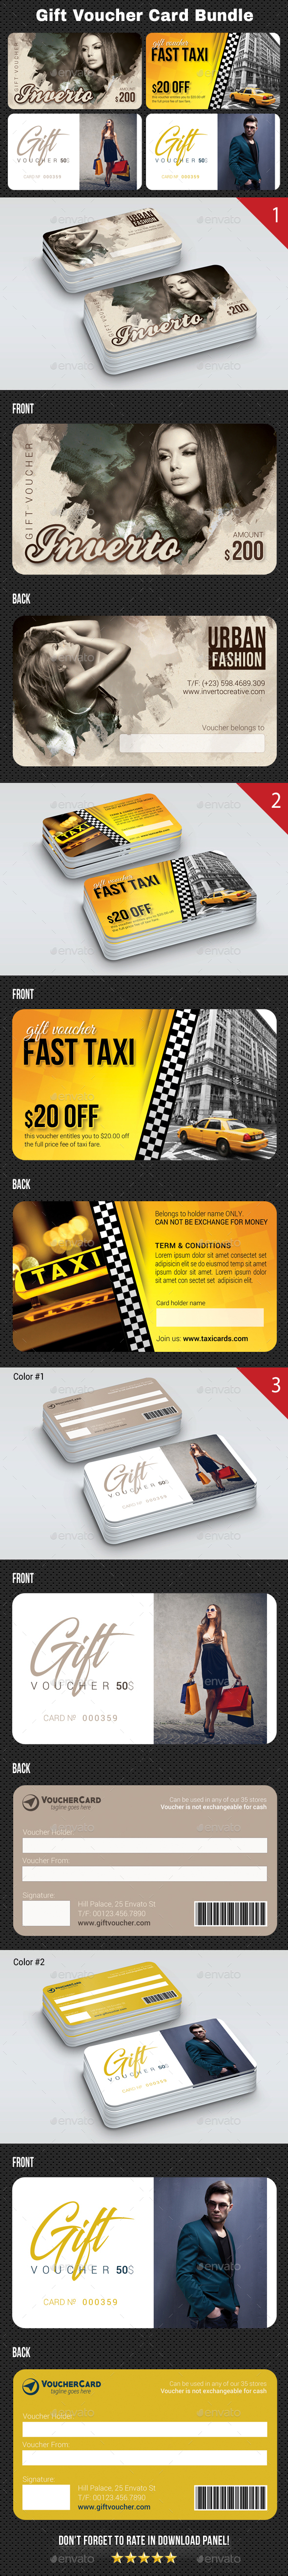 3 Gift Voucher Card Bundle 3 - Cards & Invites Print Templates